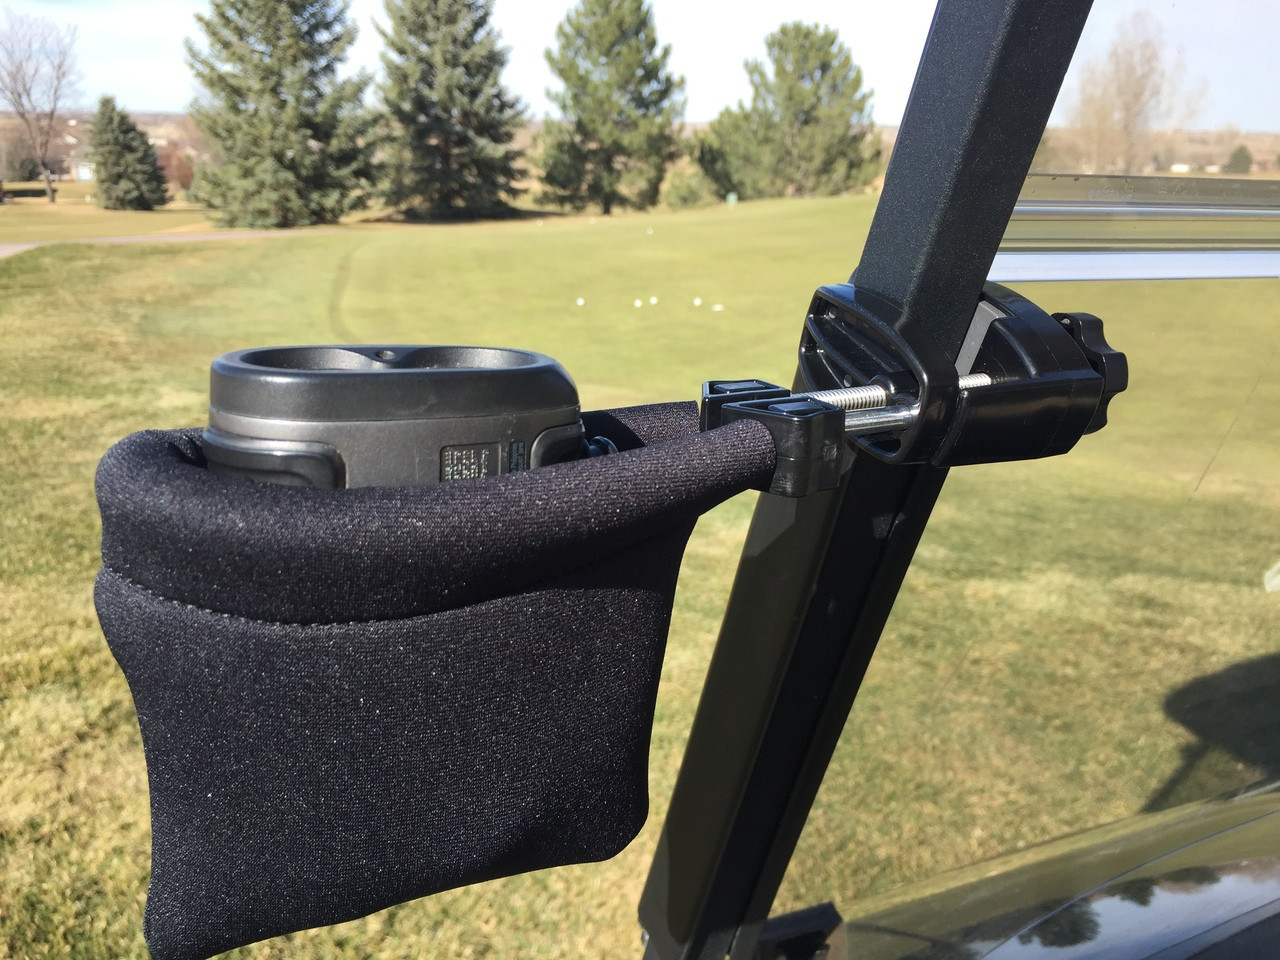 Laser Rangefinder Golf Cart Holder / Mount Pouch Mount - Cad Buddy on golf buddy customer service, golf buddy accessories, golf baby cart, golf buddy support,